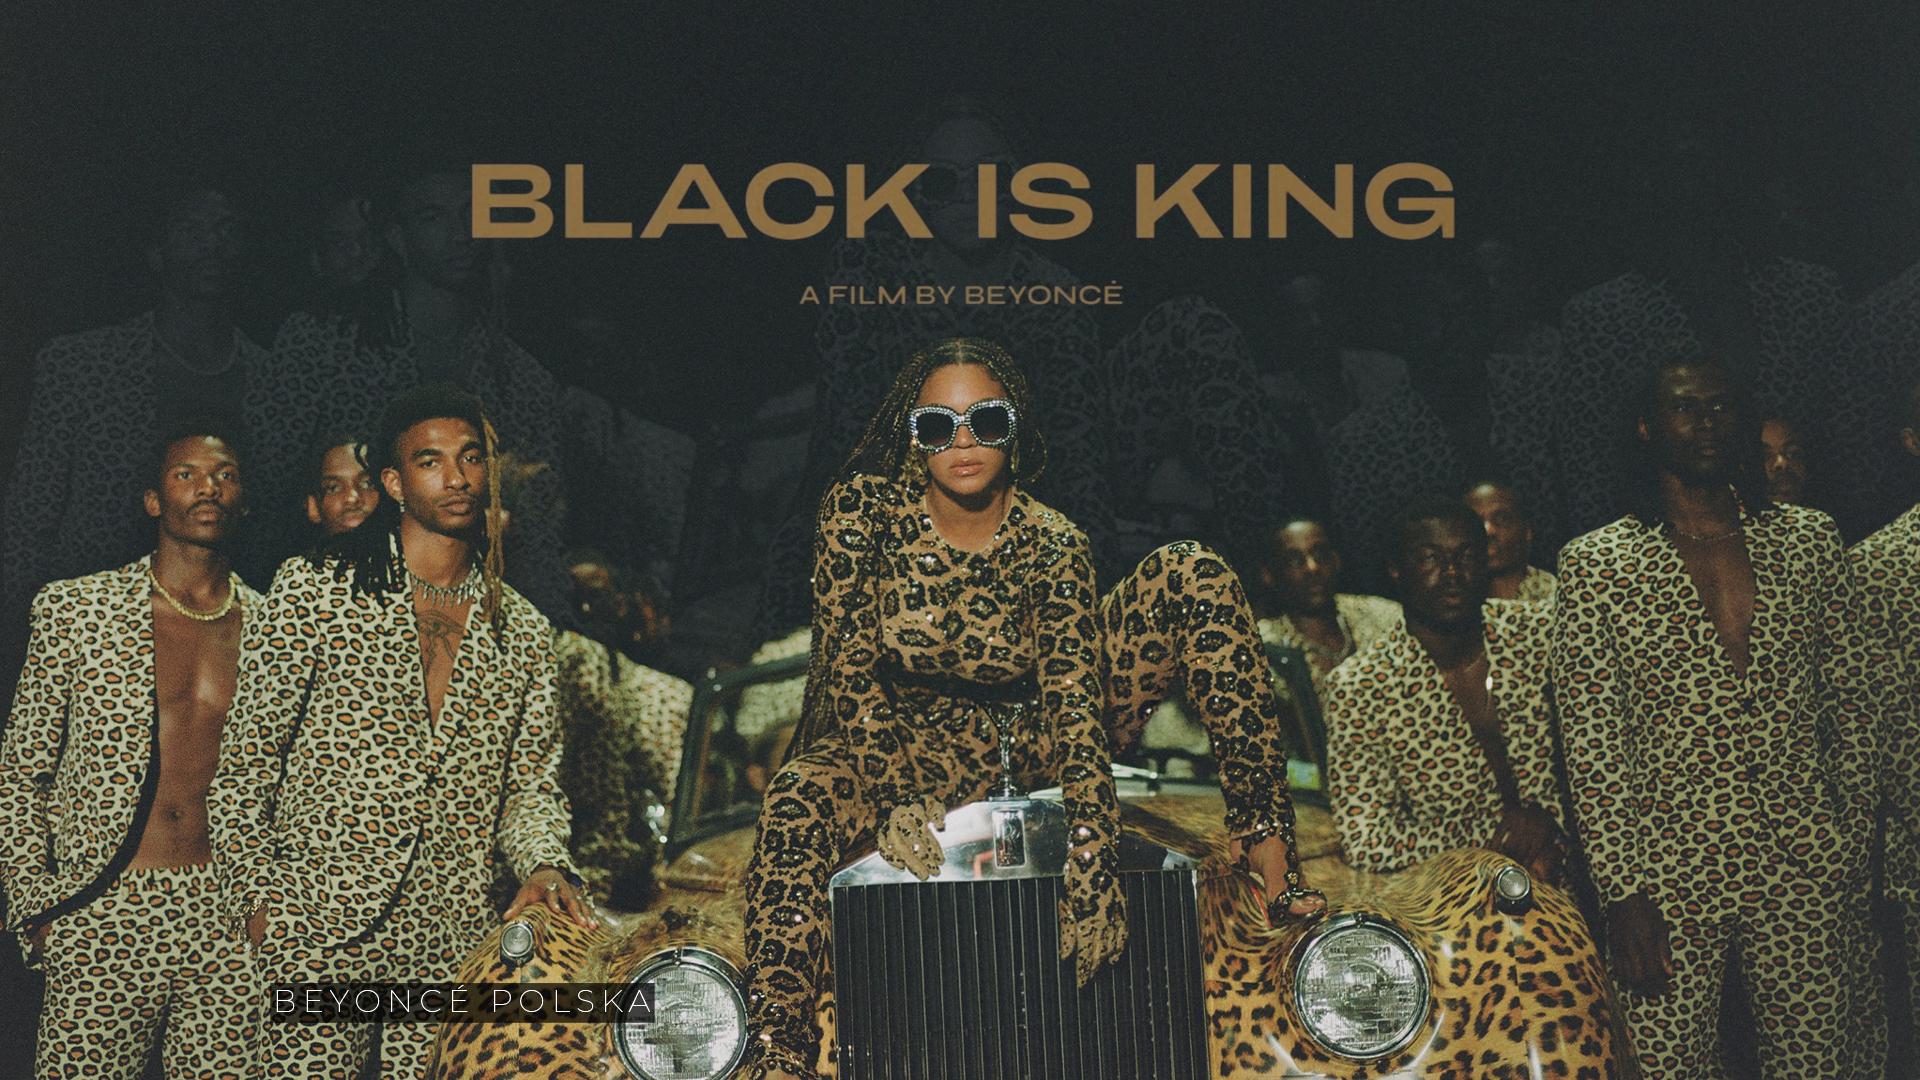 BLACKISKING_bpl_strona